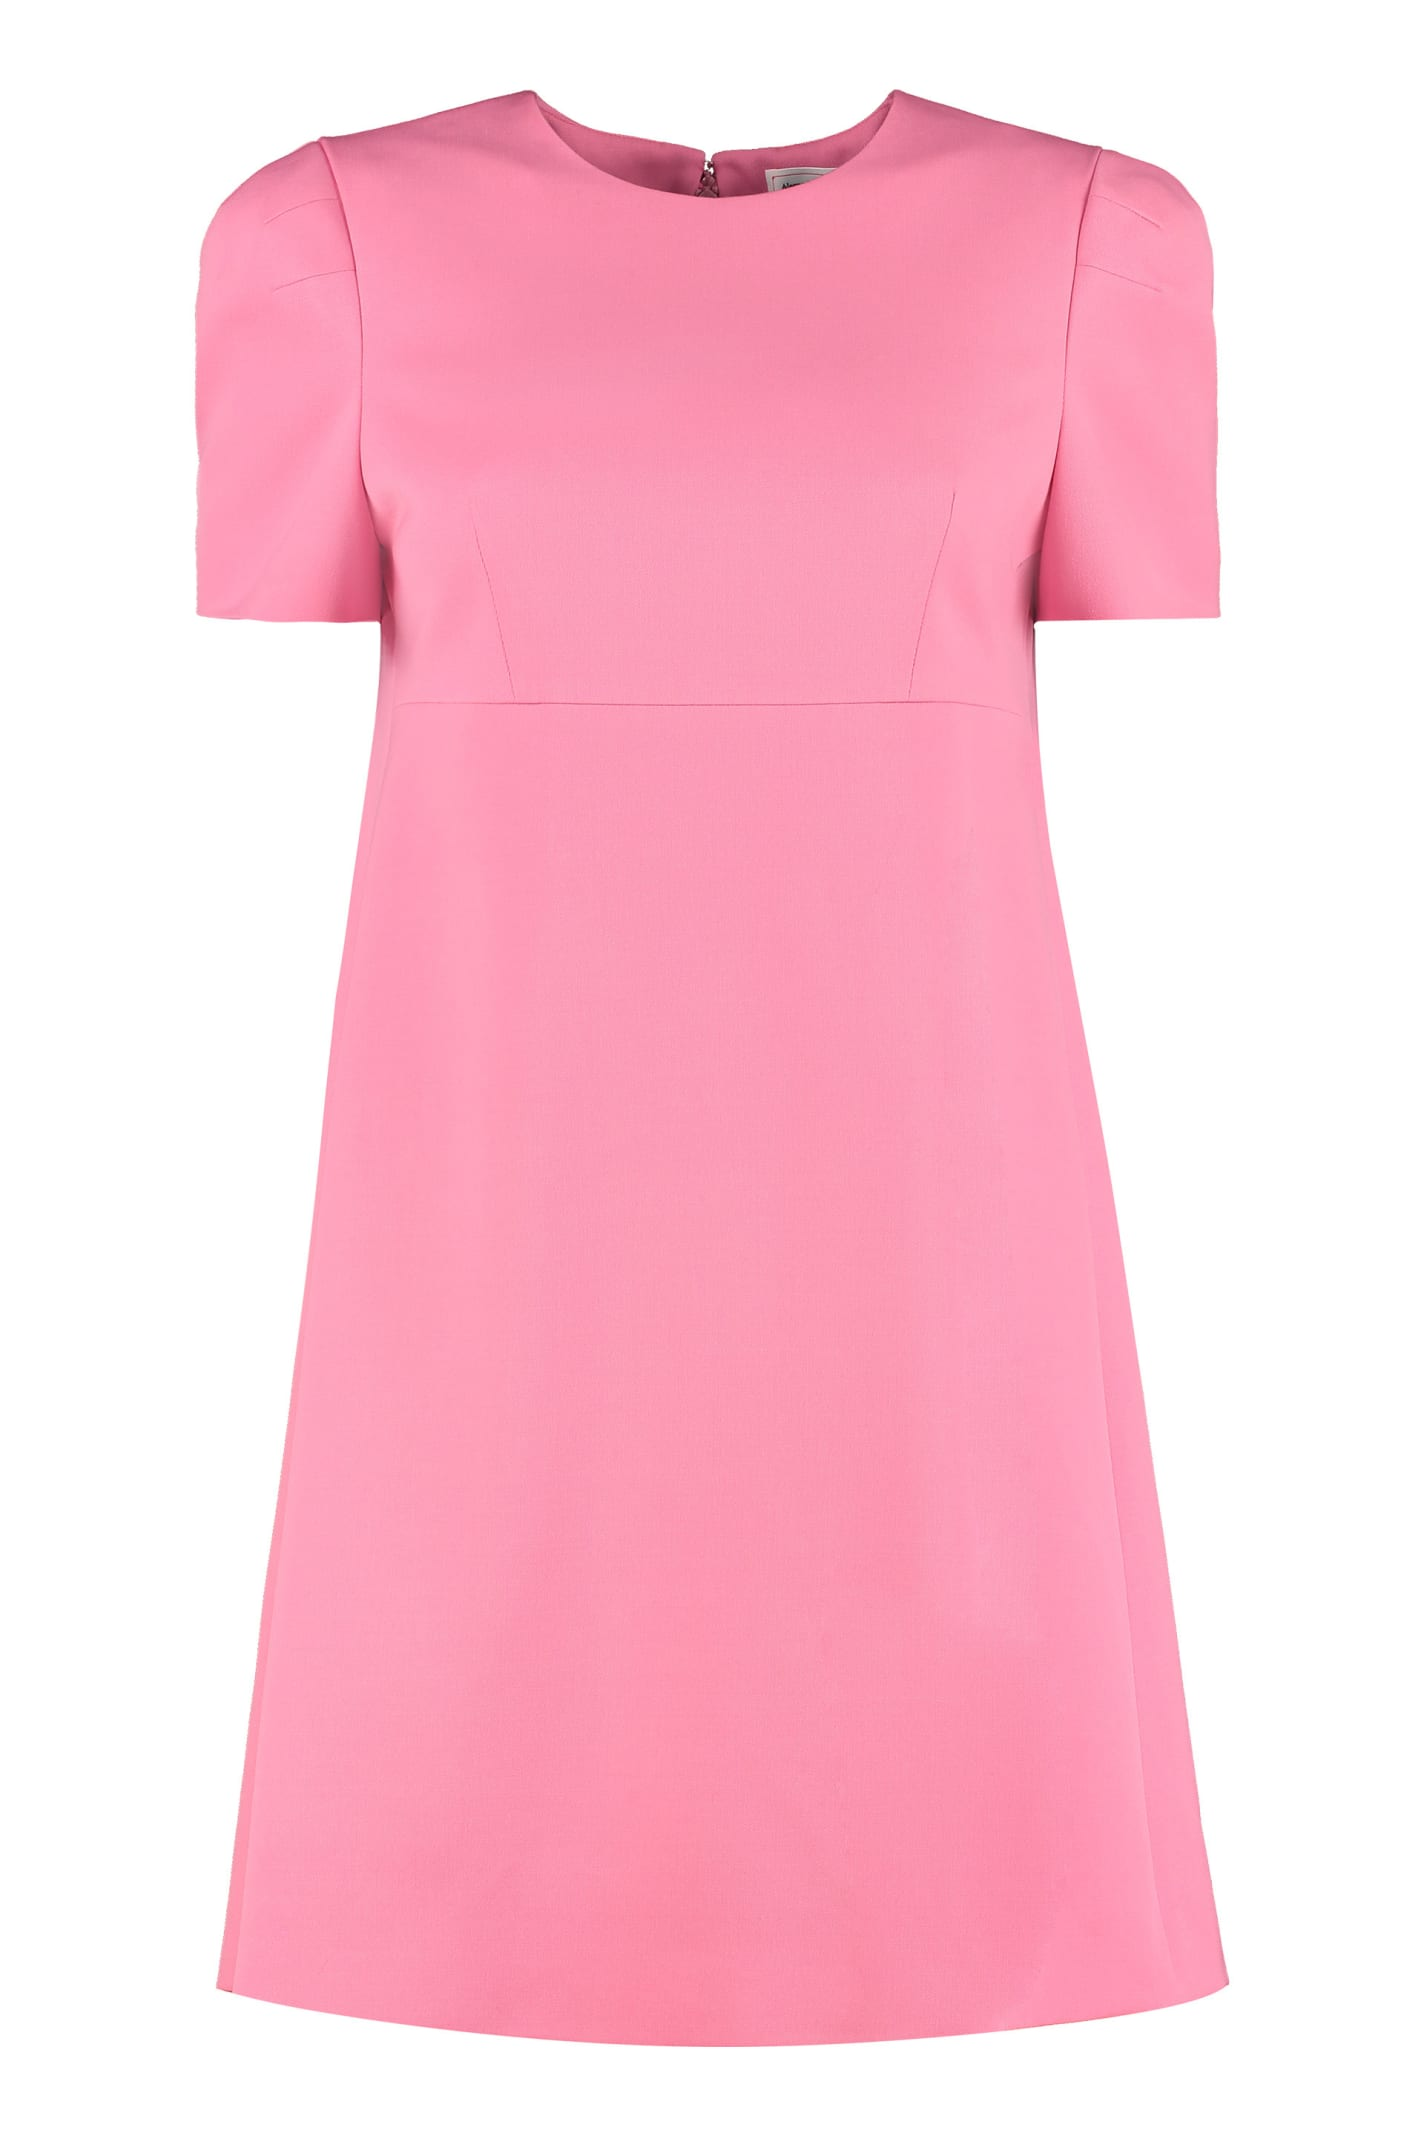 Buy Alexander McQueen Flared Mini Dress online, shop Alexander McQueen with free shipping